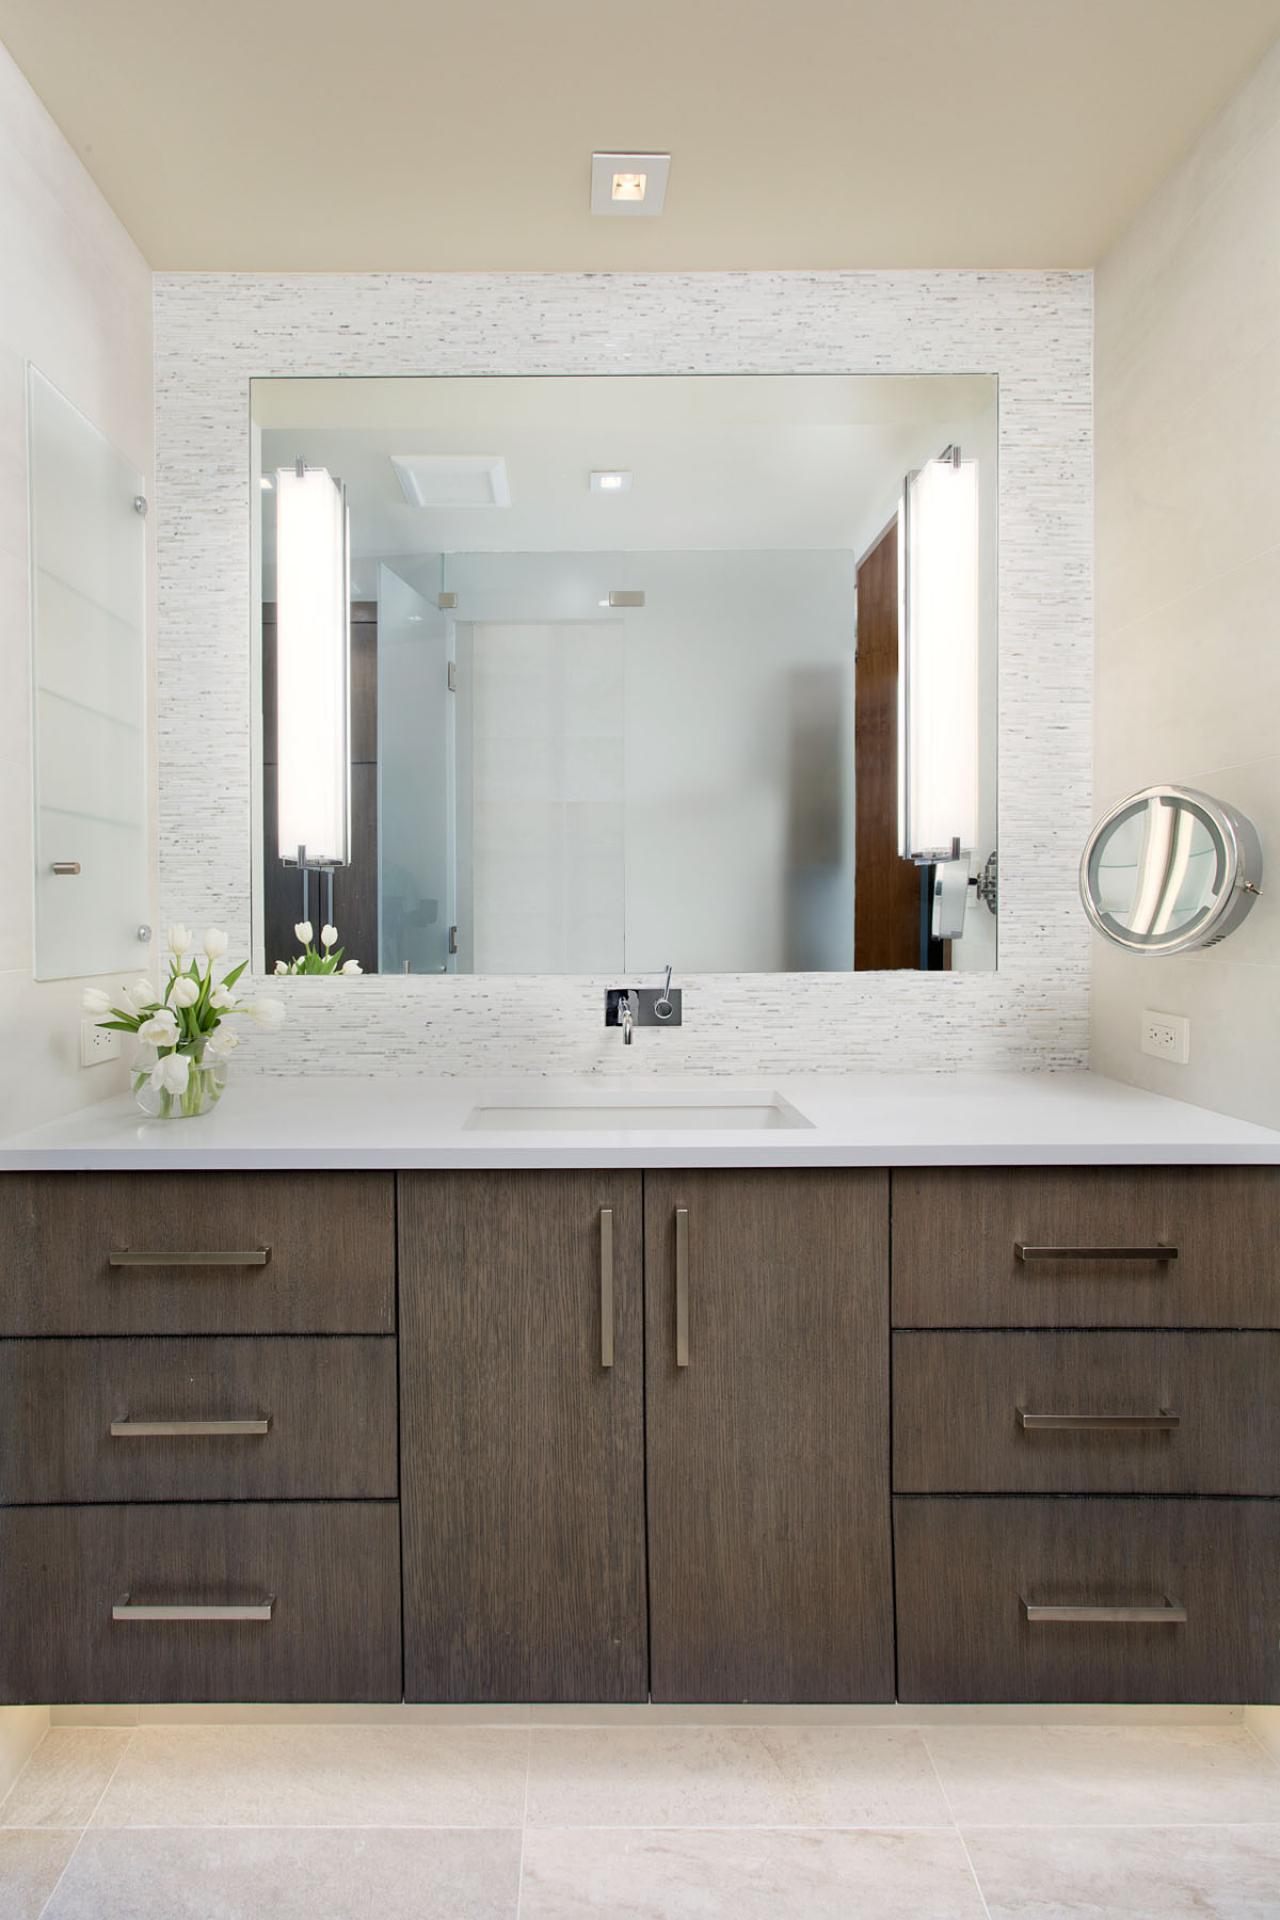 White Bathroom Decor Ideas: Pictures & Tips From HGTV   HGTV